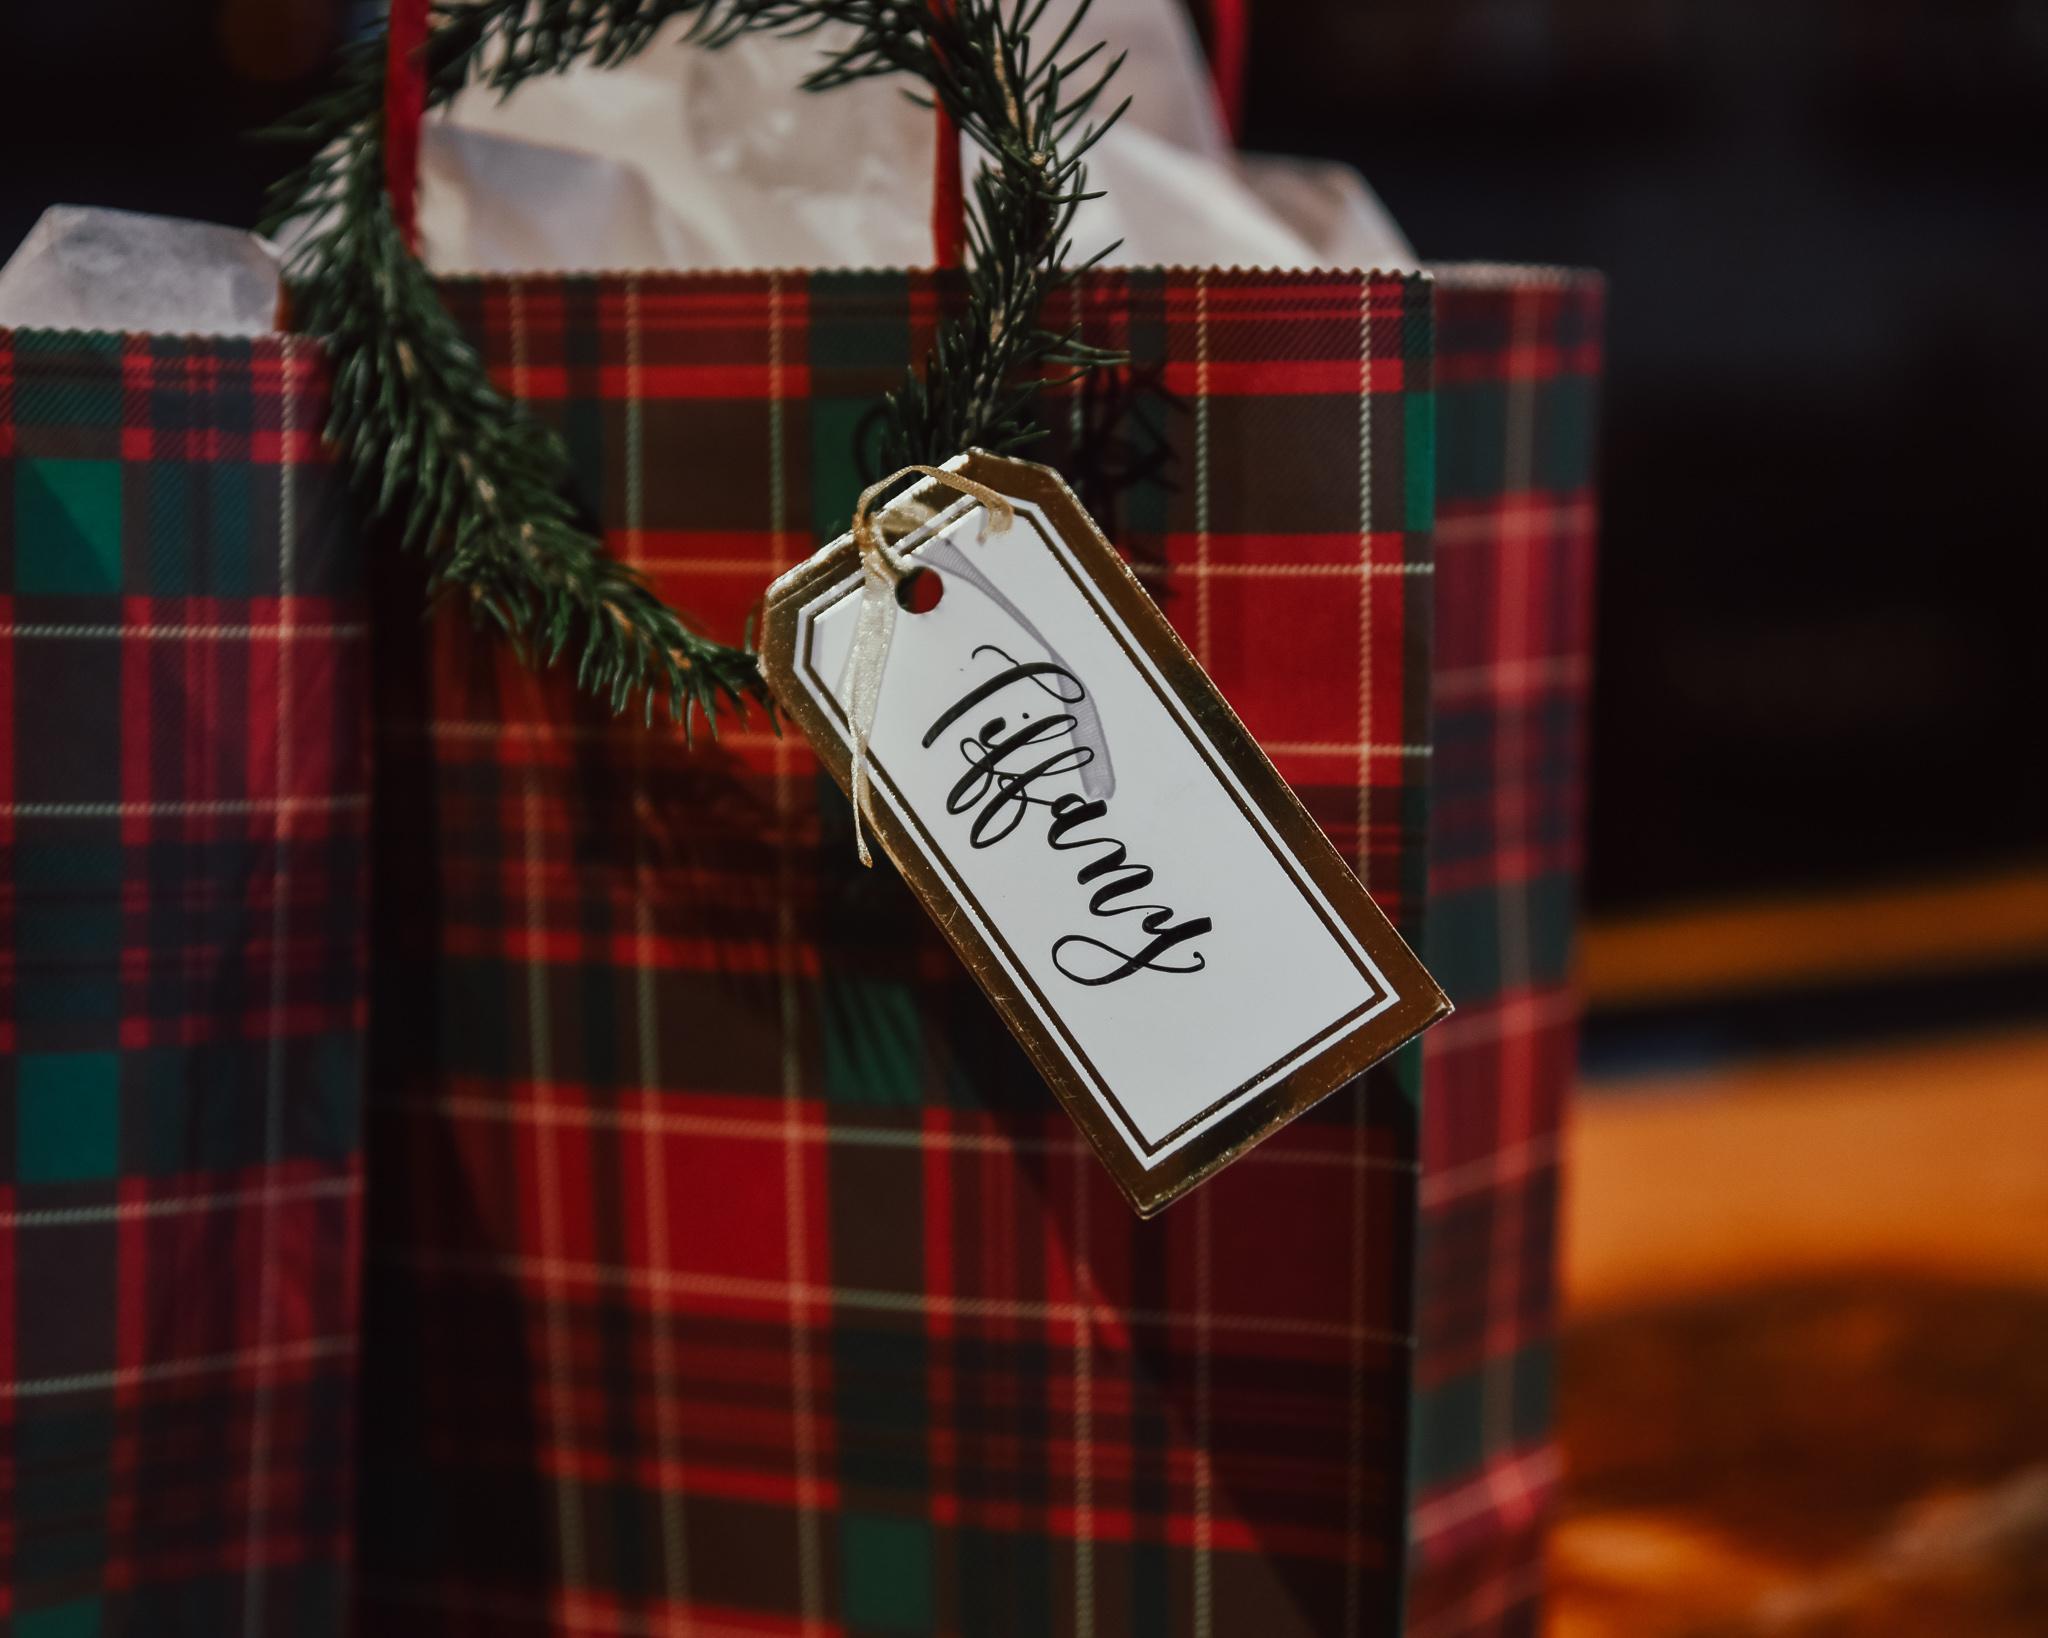 Pine-Wreath-Gift-Tag-Holiday-DIY-3.jpg